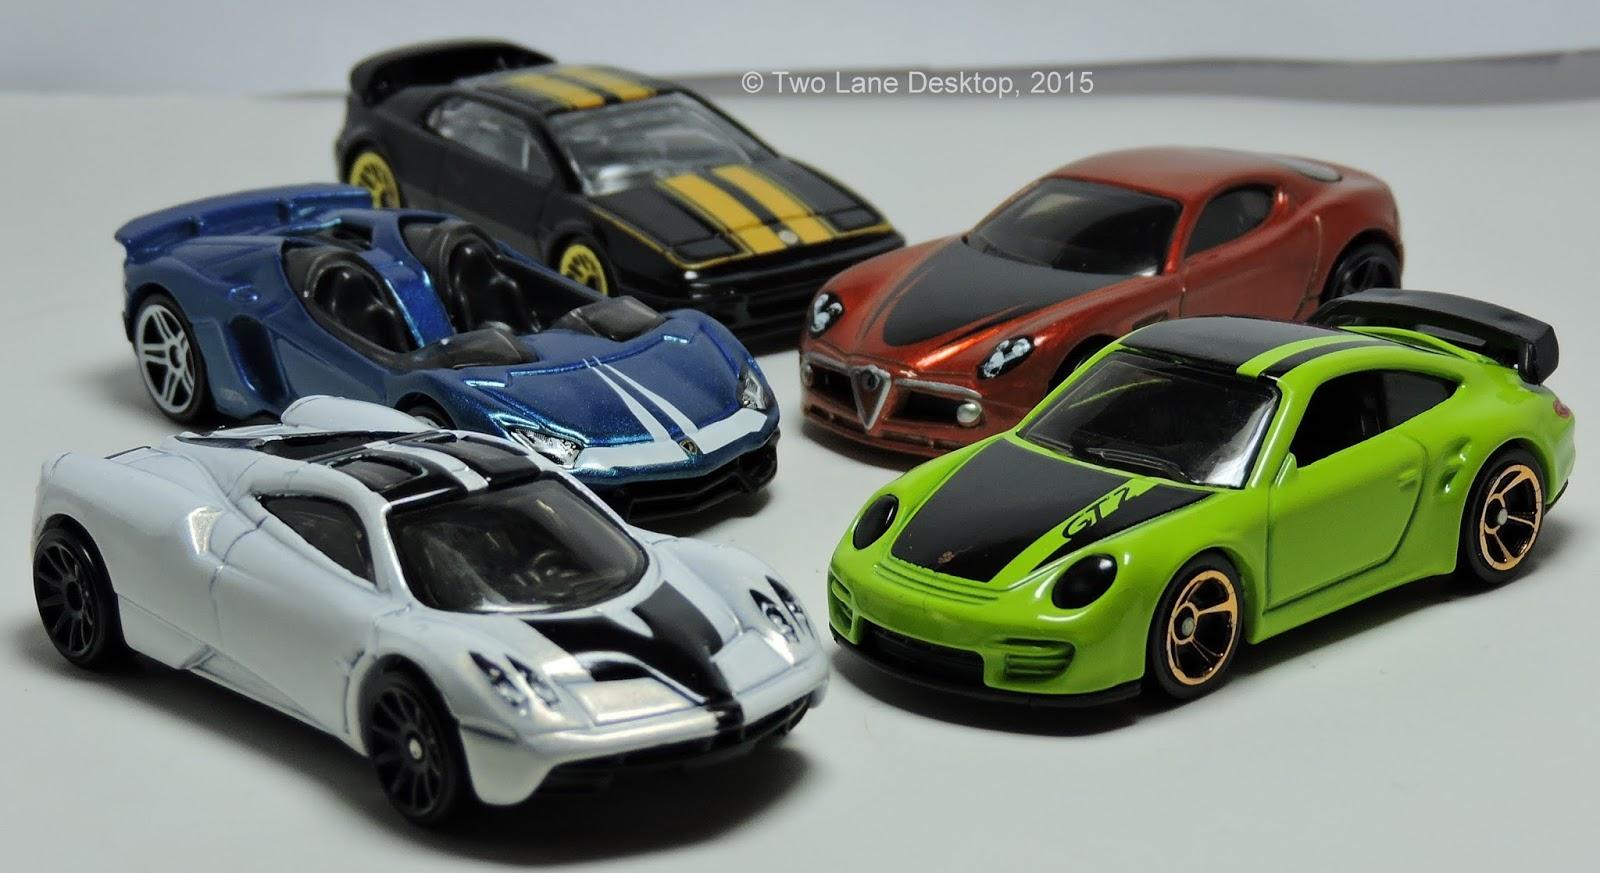 Hot wheels cars 2015